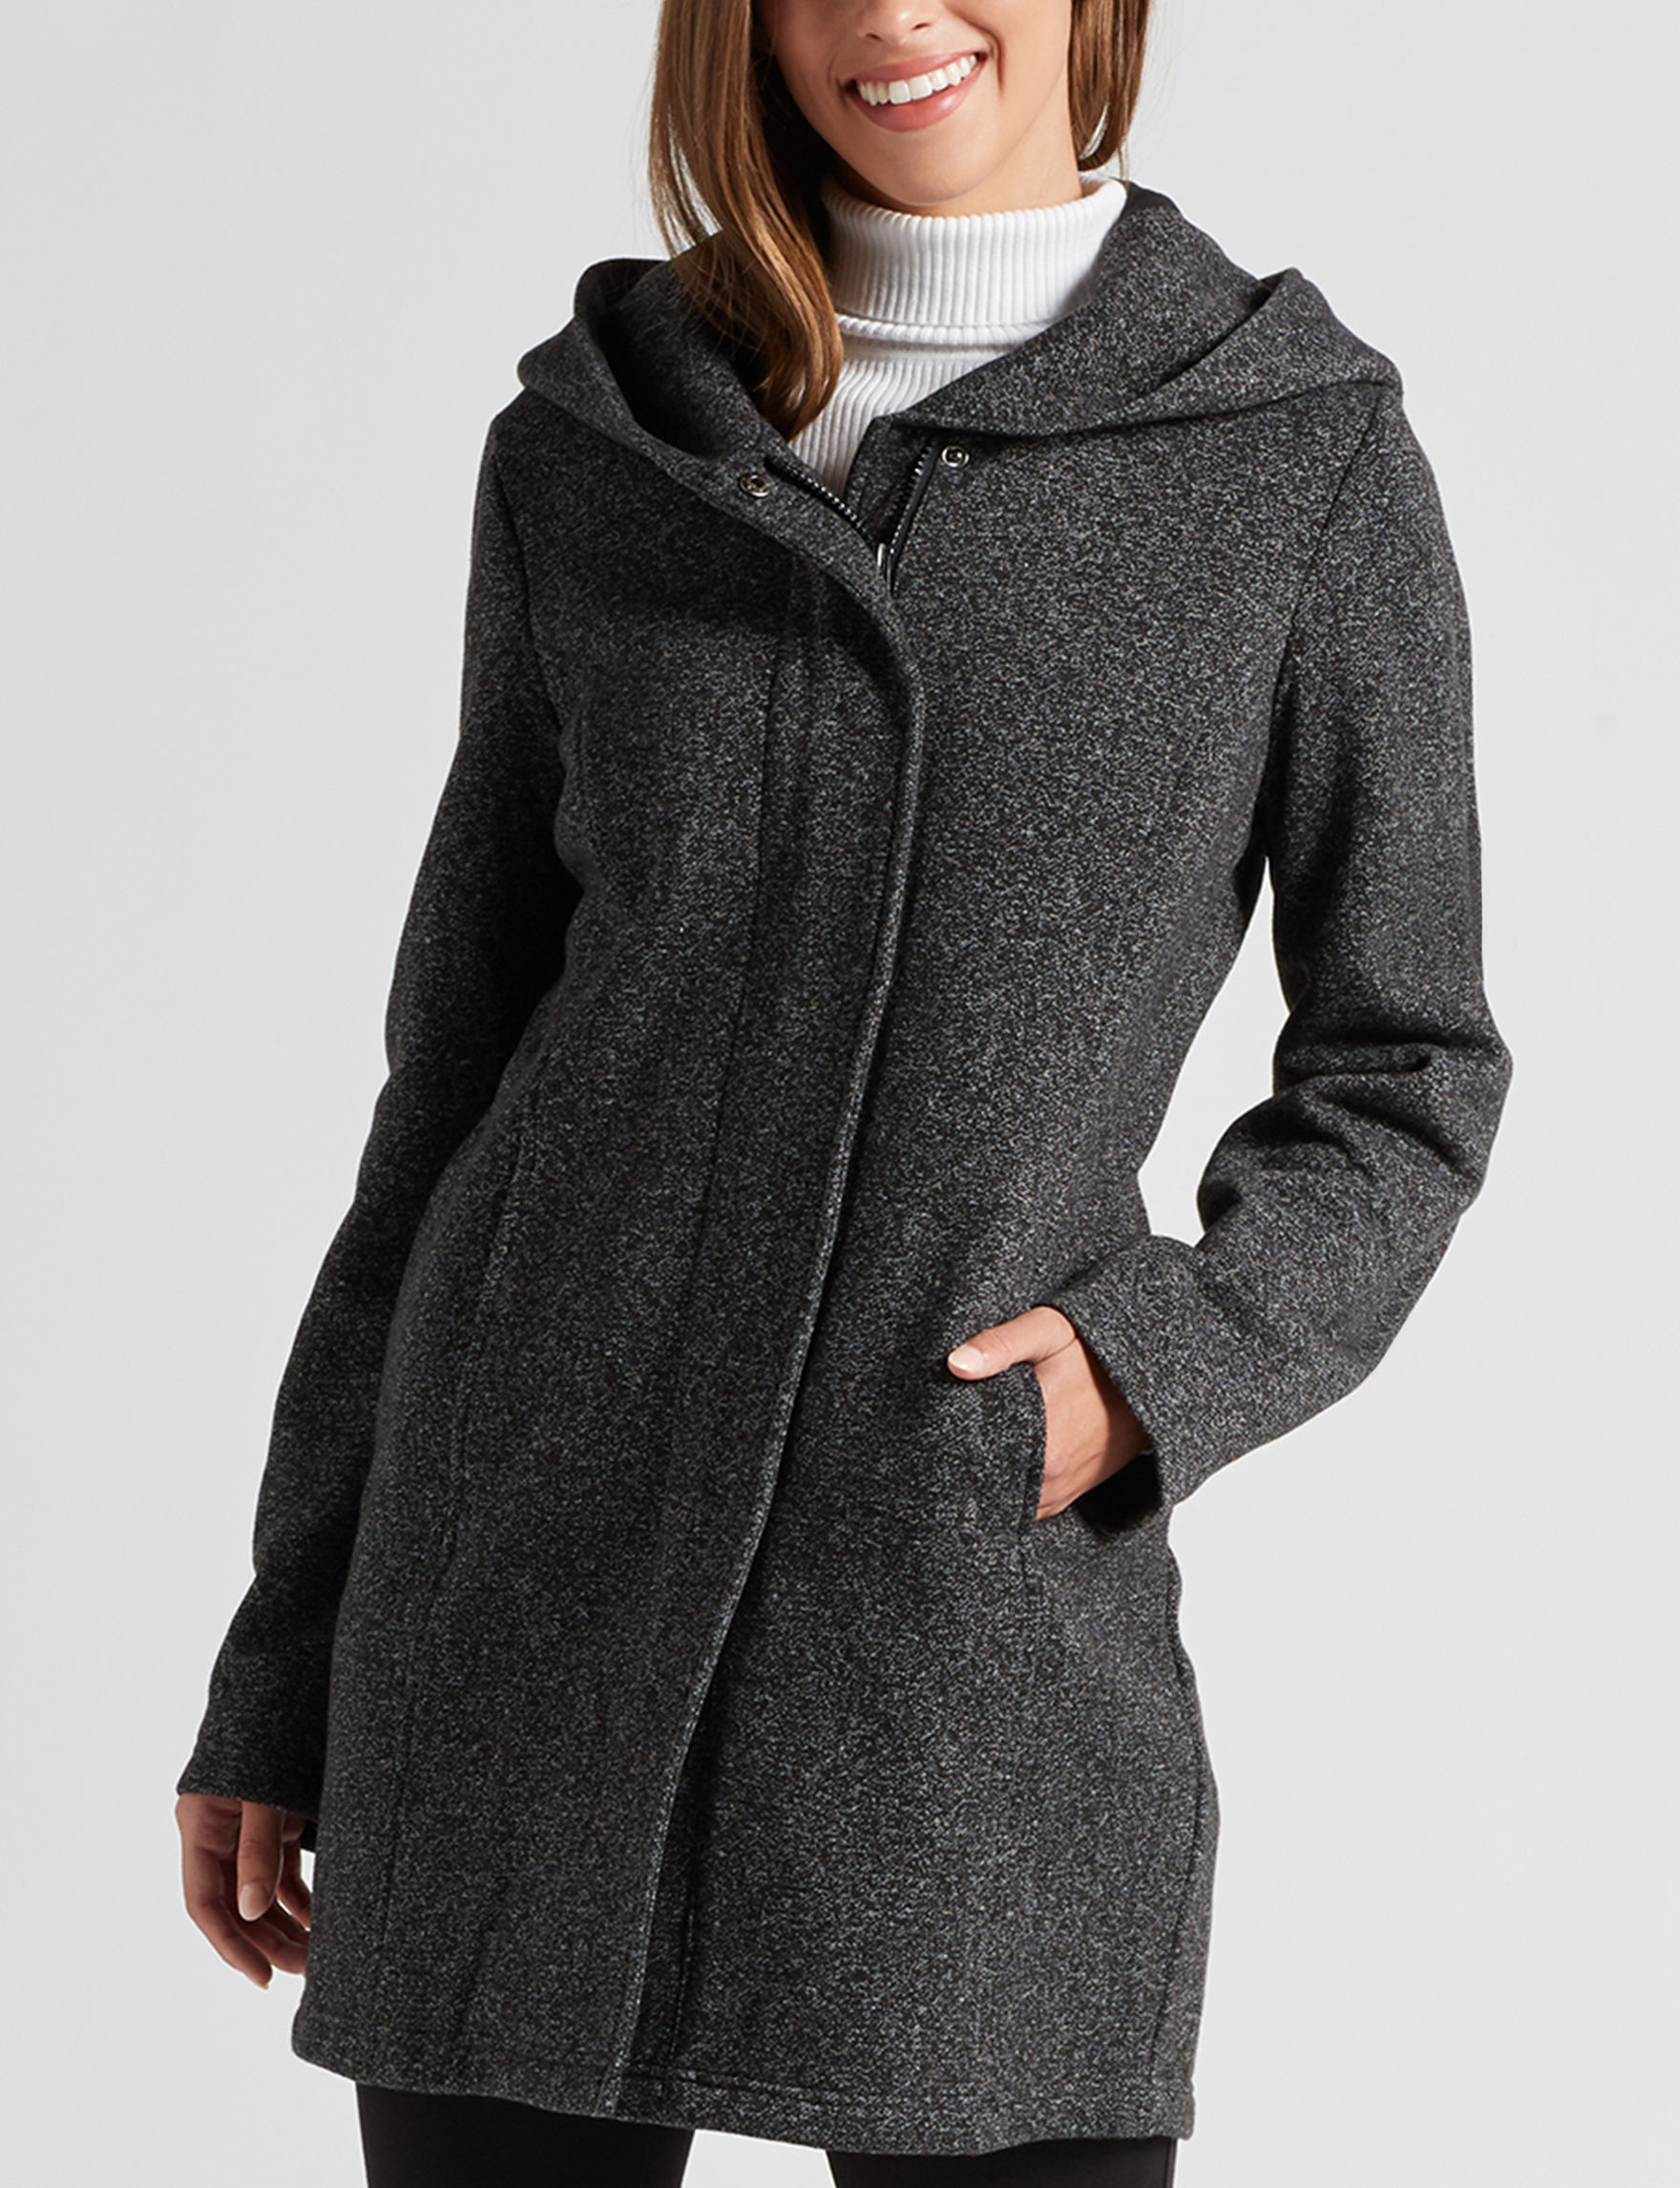 Sebby Collection Black Lightweight Jackets & Blazers